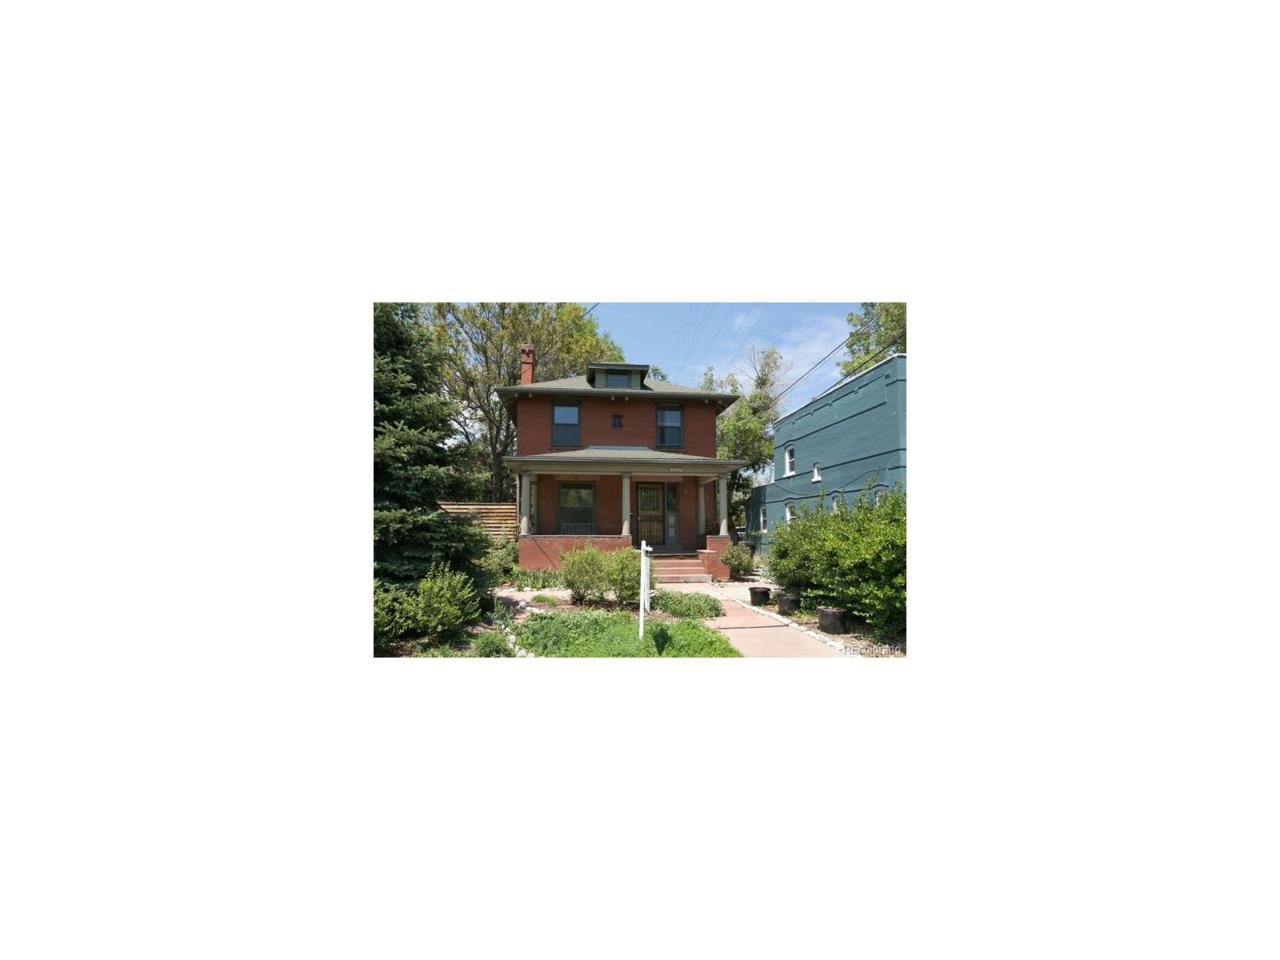 1319 E 23rd Avenue, Denver, CO 80205 (MLS #9039533) :: 8z Real Estate